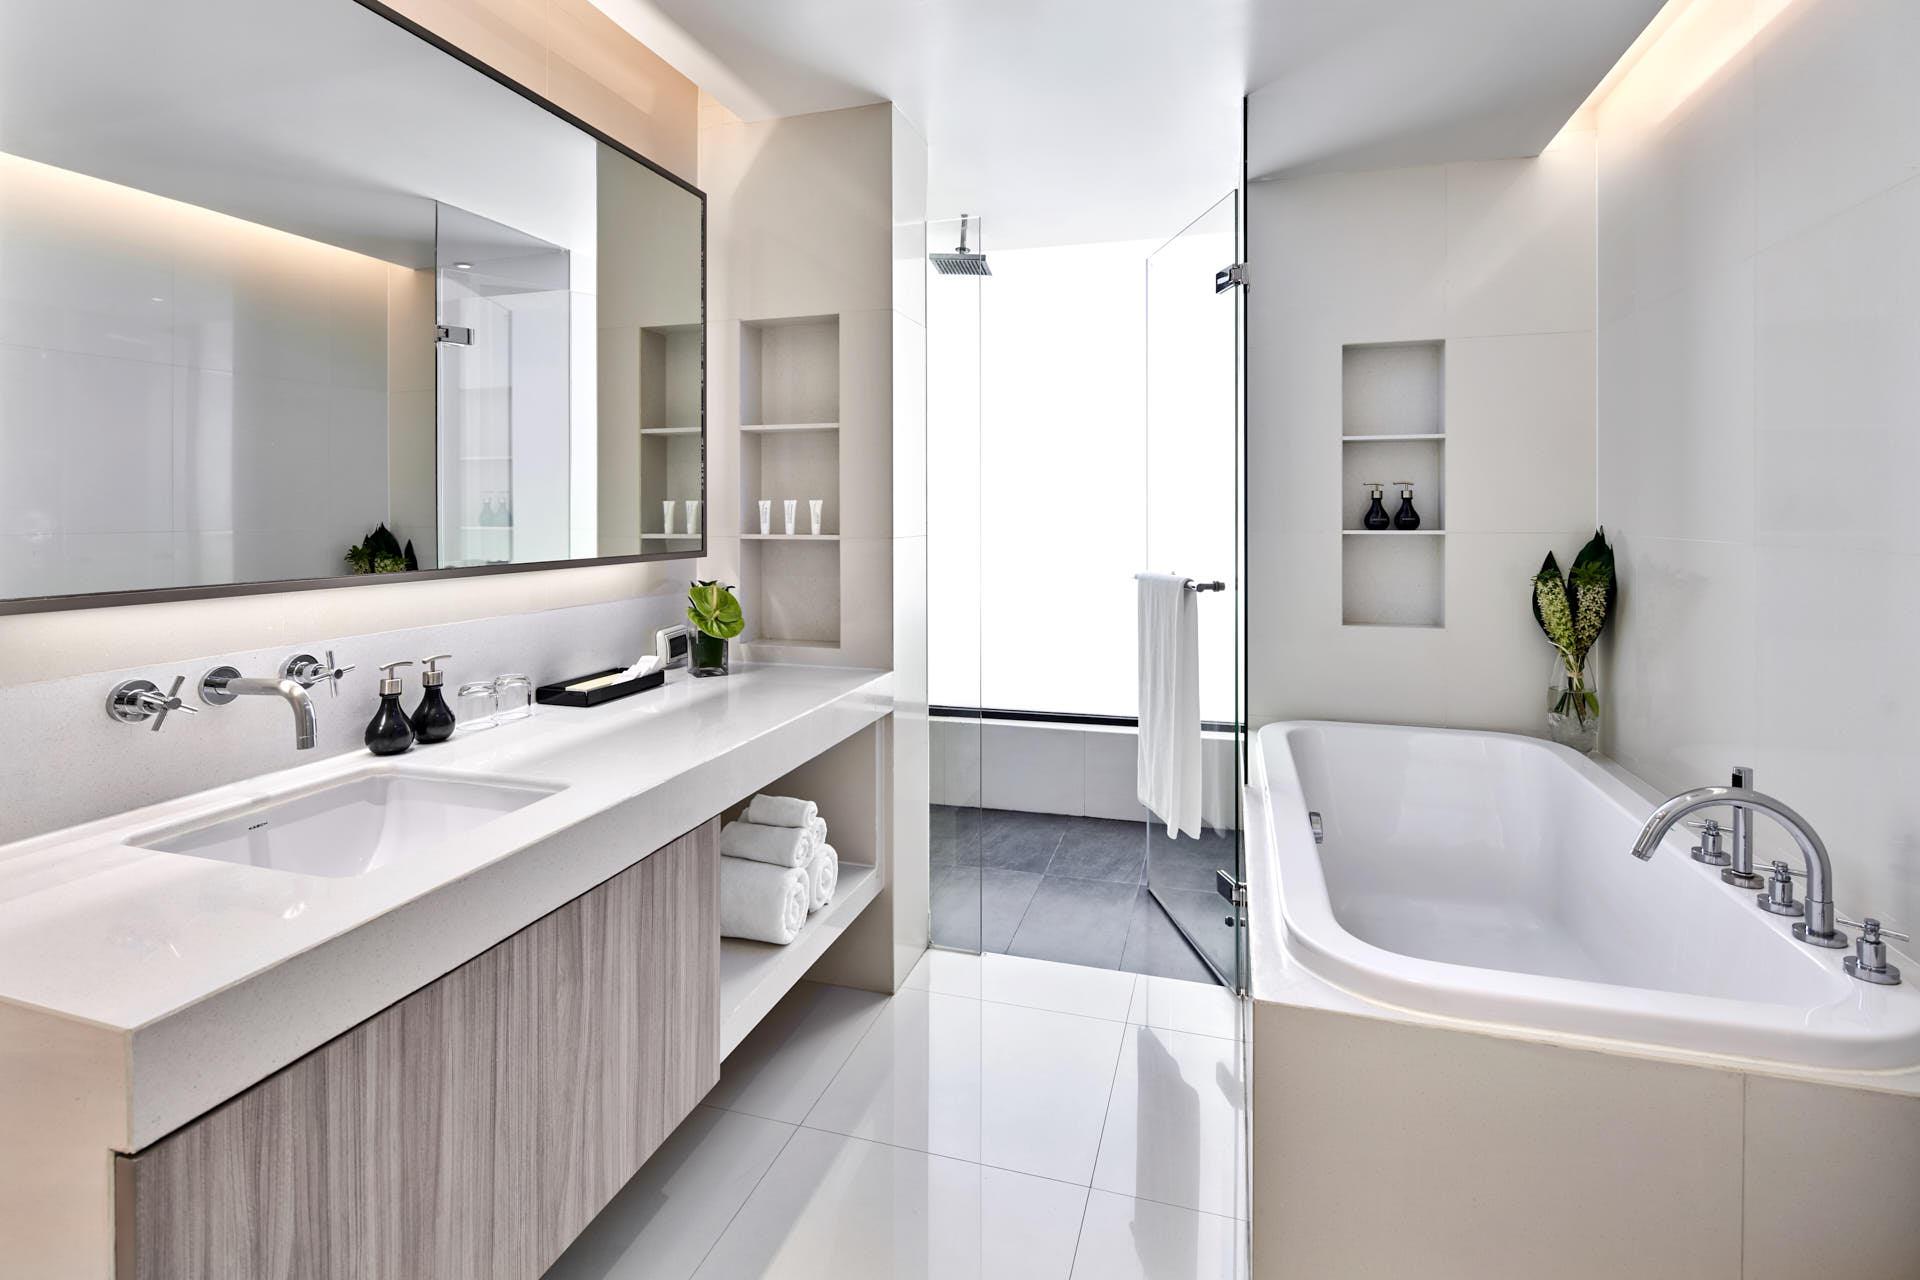 Luxury hotel bathroom photo with bathtub and shower with towel on door